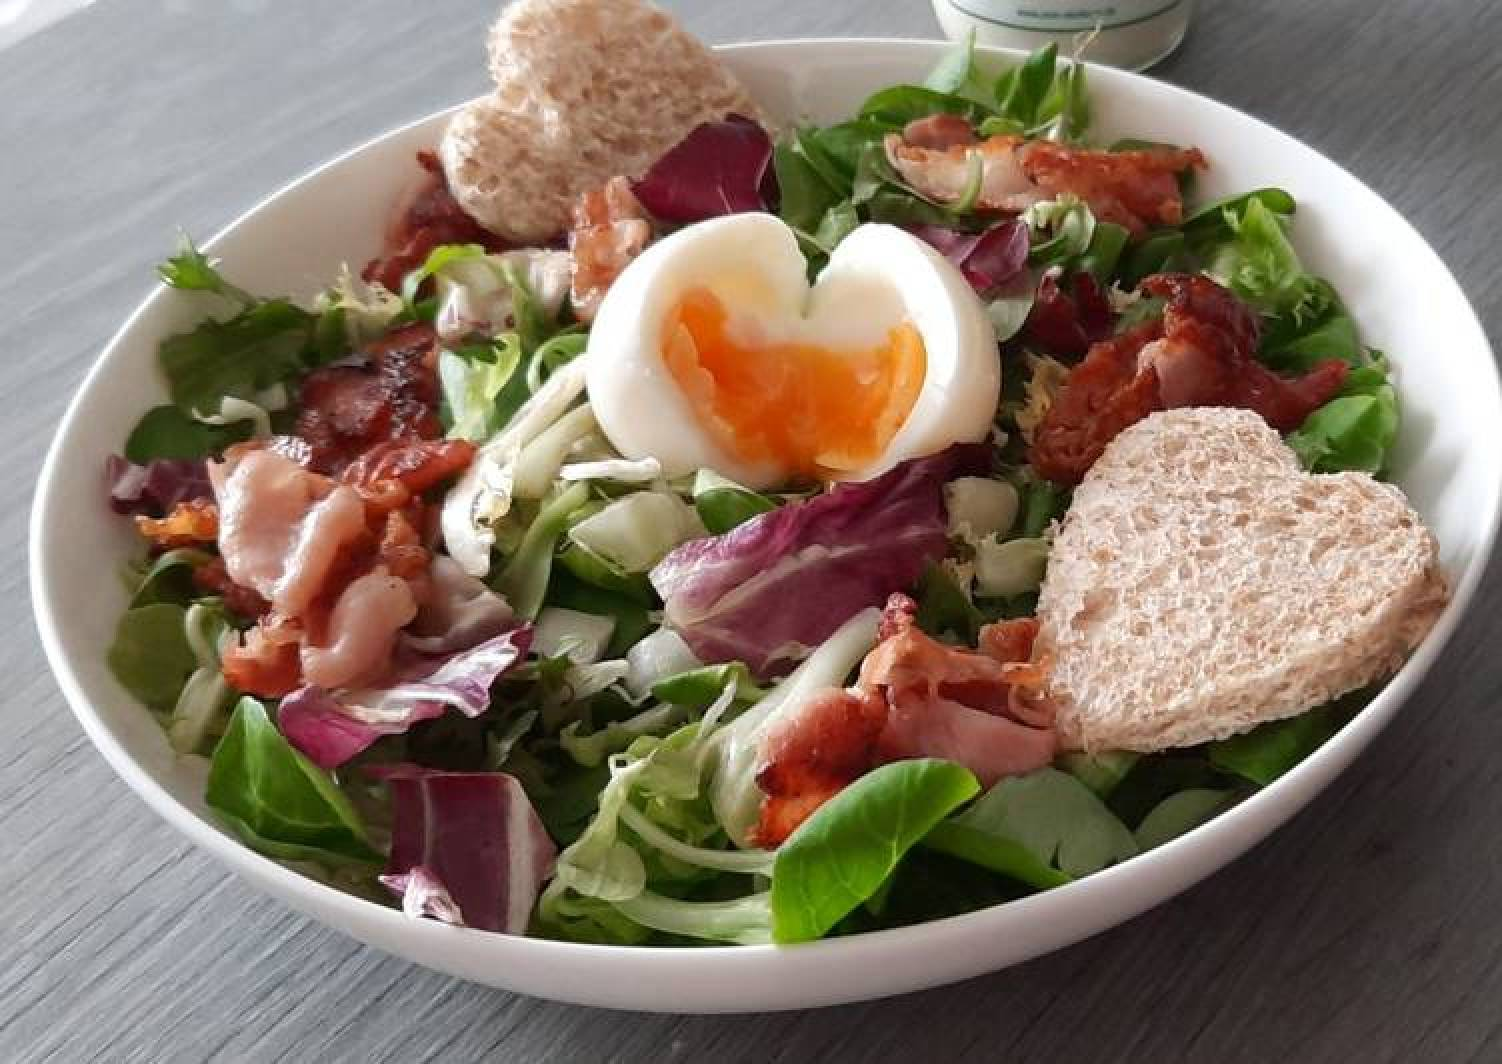 Lunch field salad